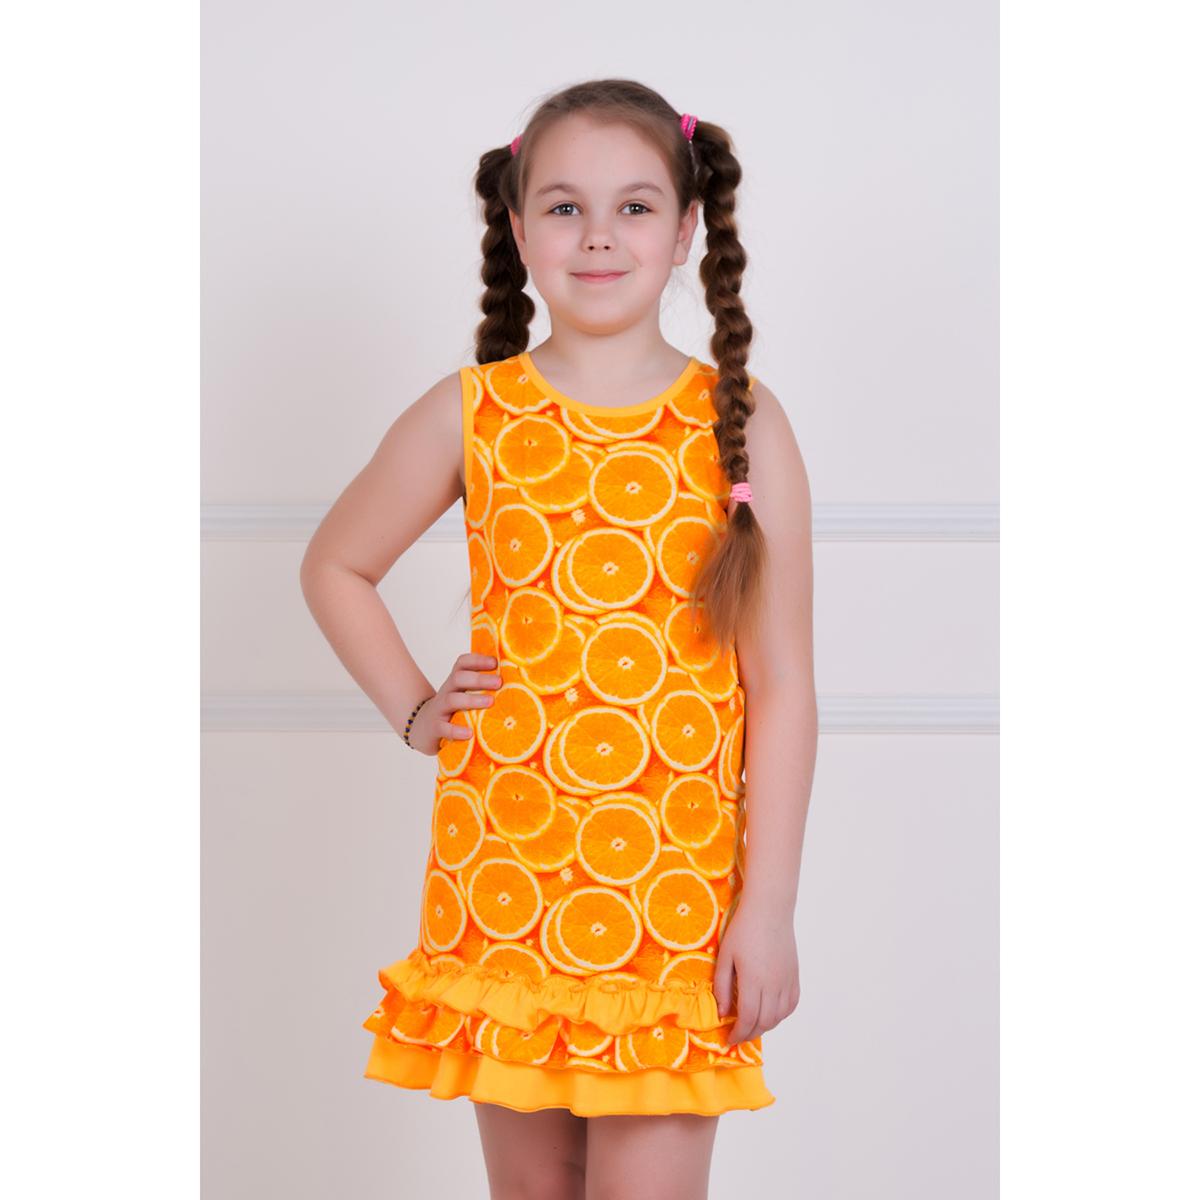 Детское платье Мандаринка, размер 7 летПлатья и сарафаны<br>Рост:122-128<br><br>Тип: Дет. платье<br>Размер: 7 лет<br>Материал: Кулирка